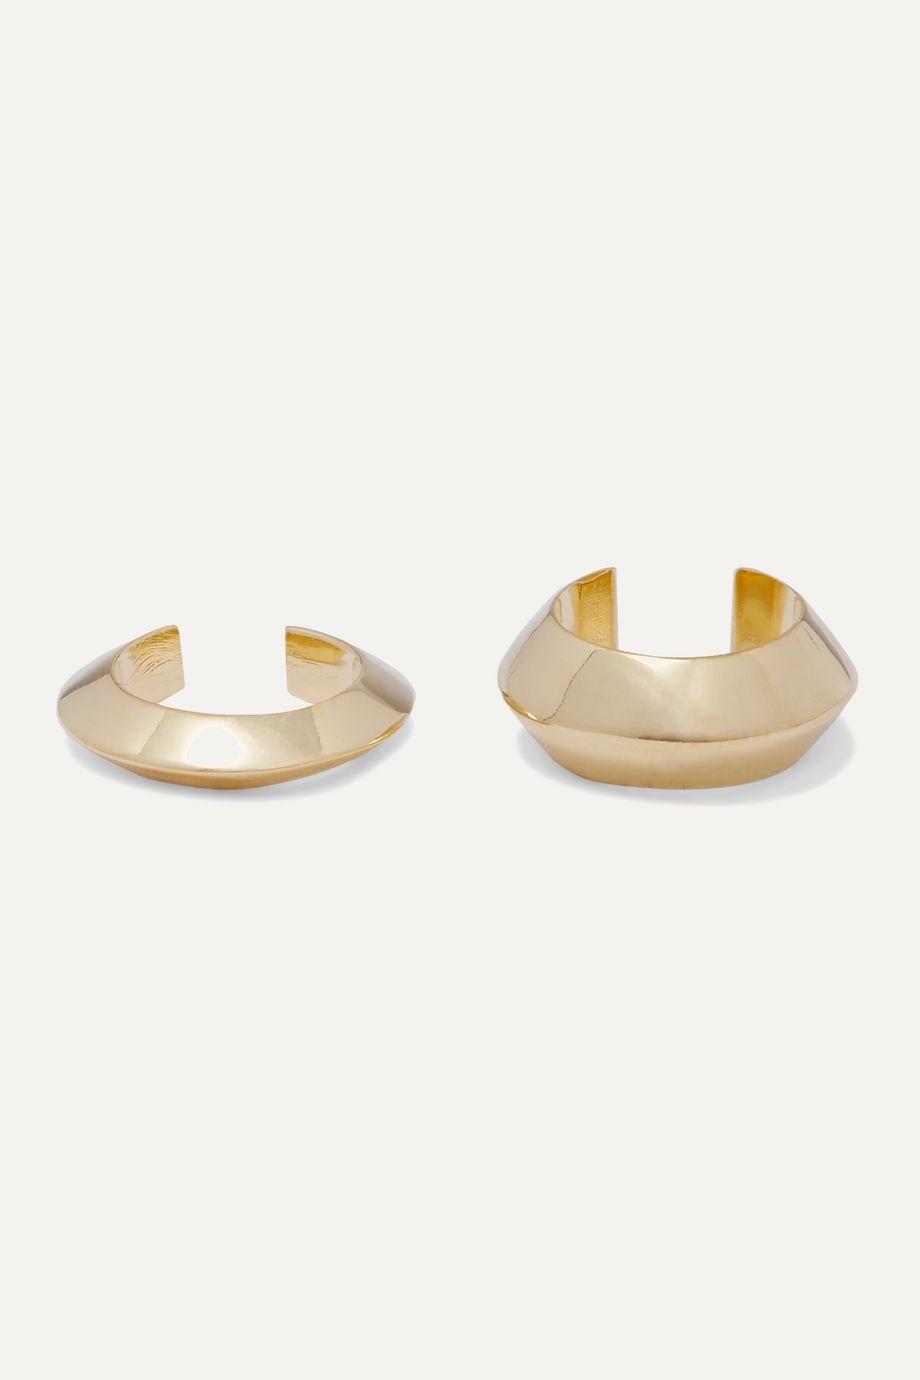 Saskia Diez Pyramid set of two gold-plated ear cuffs